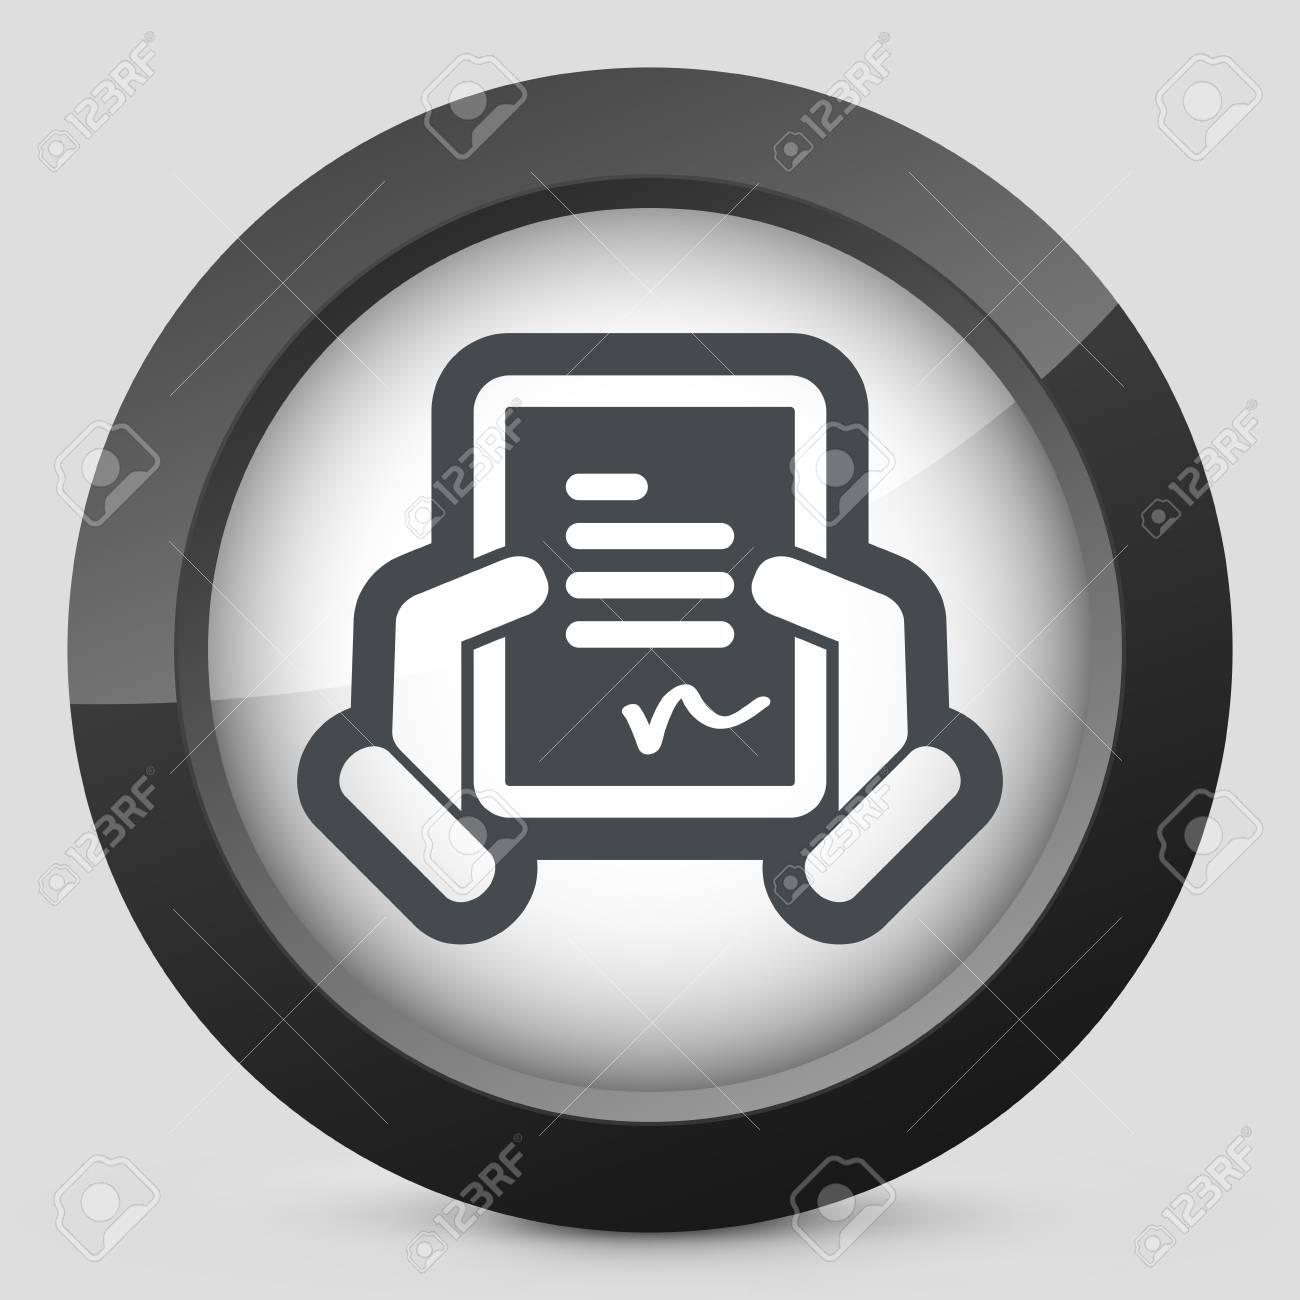 Document signature icon Stock Vector - 28218254